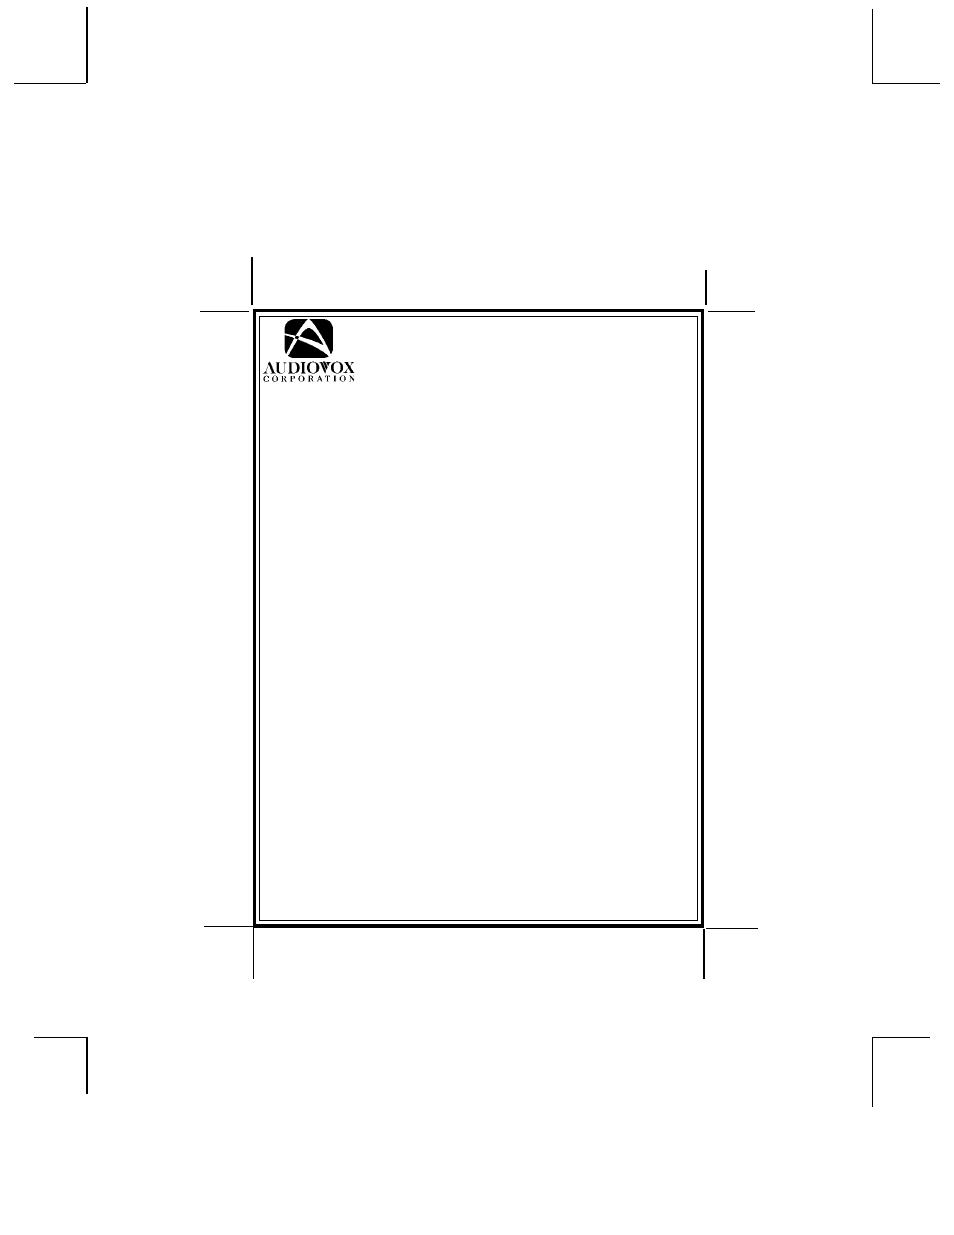 Audiovox Car Alarm Prestige 230i Wiring Diagramcar Warlock Diagram 5bcr03 Page1 For Model Ax900 Diagrams At